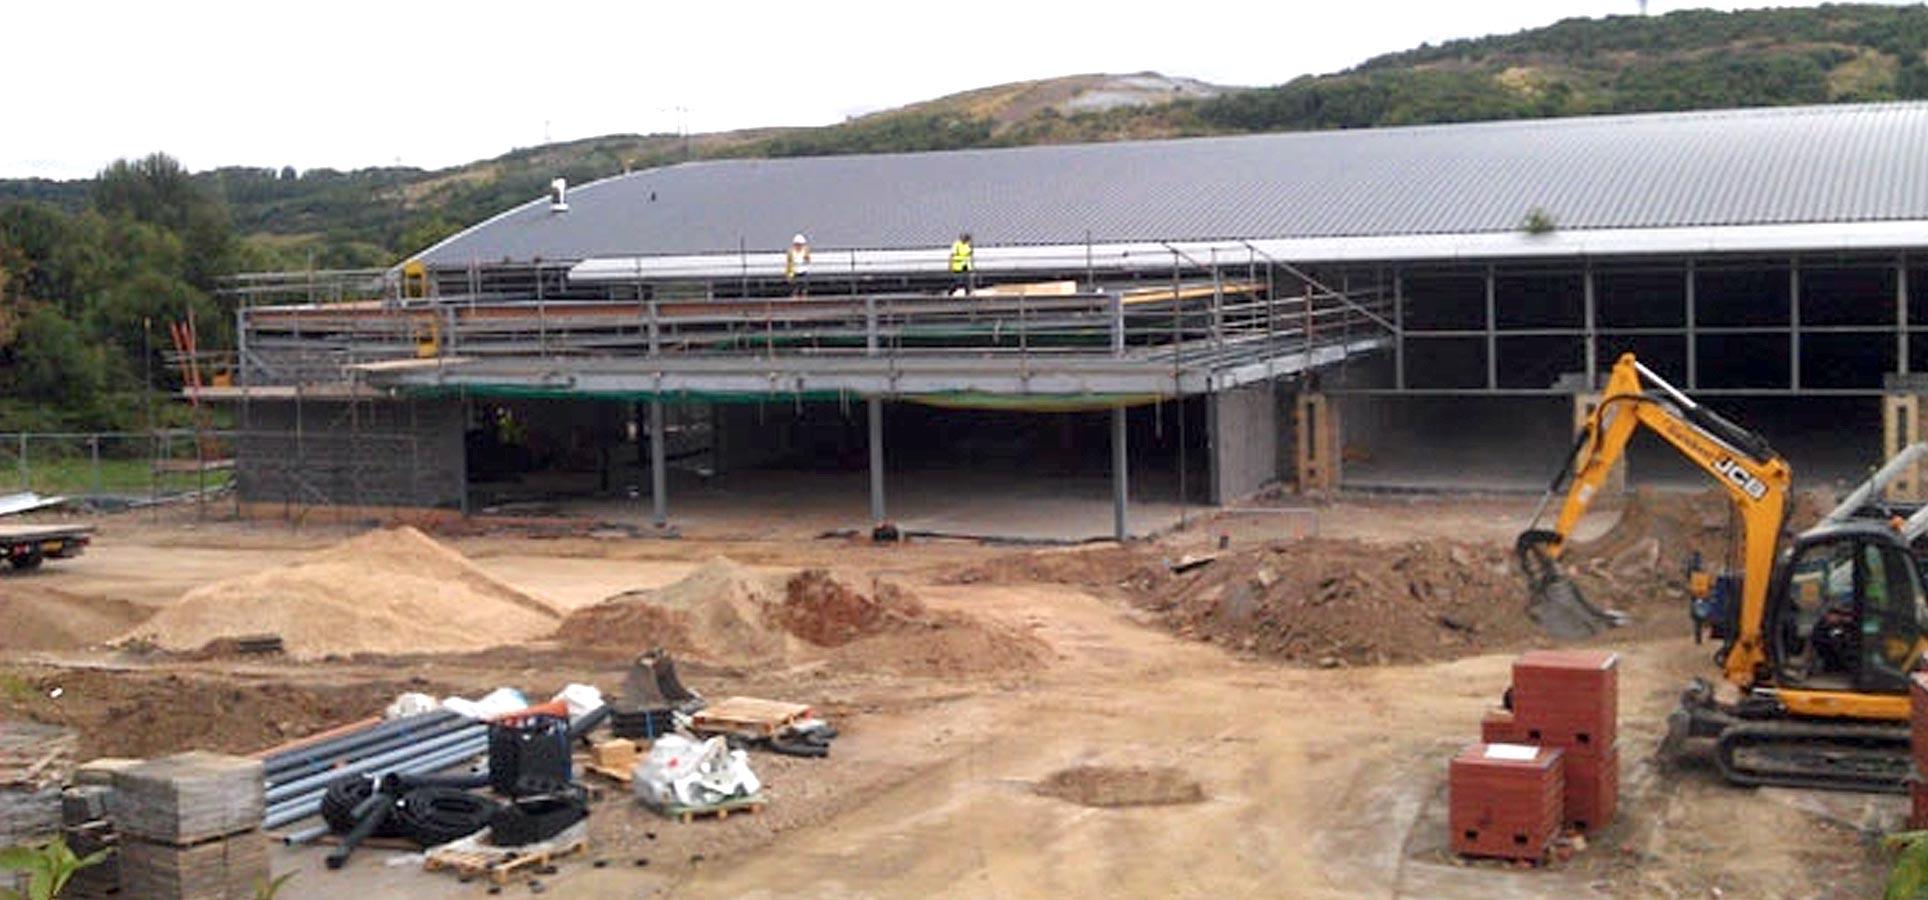 Penistone Rd, Jessops Construction Ltd